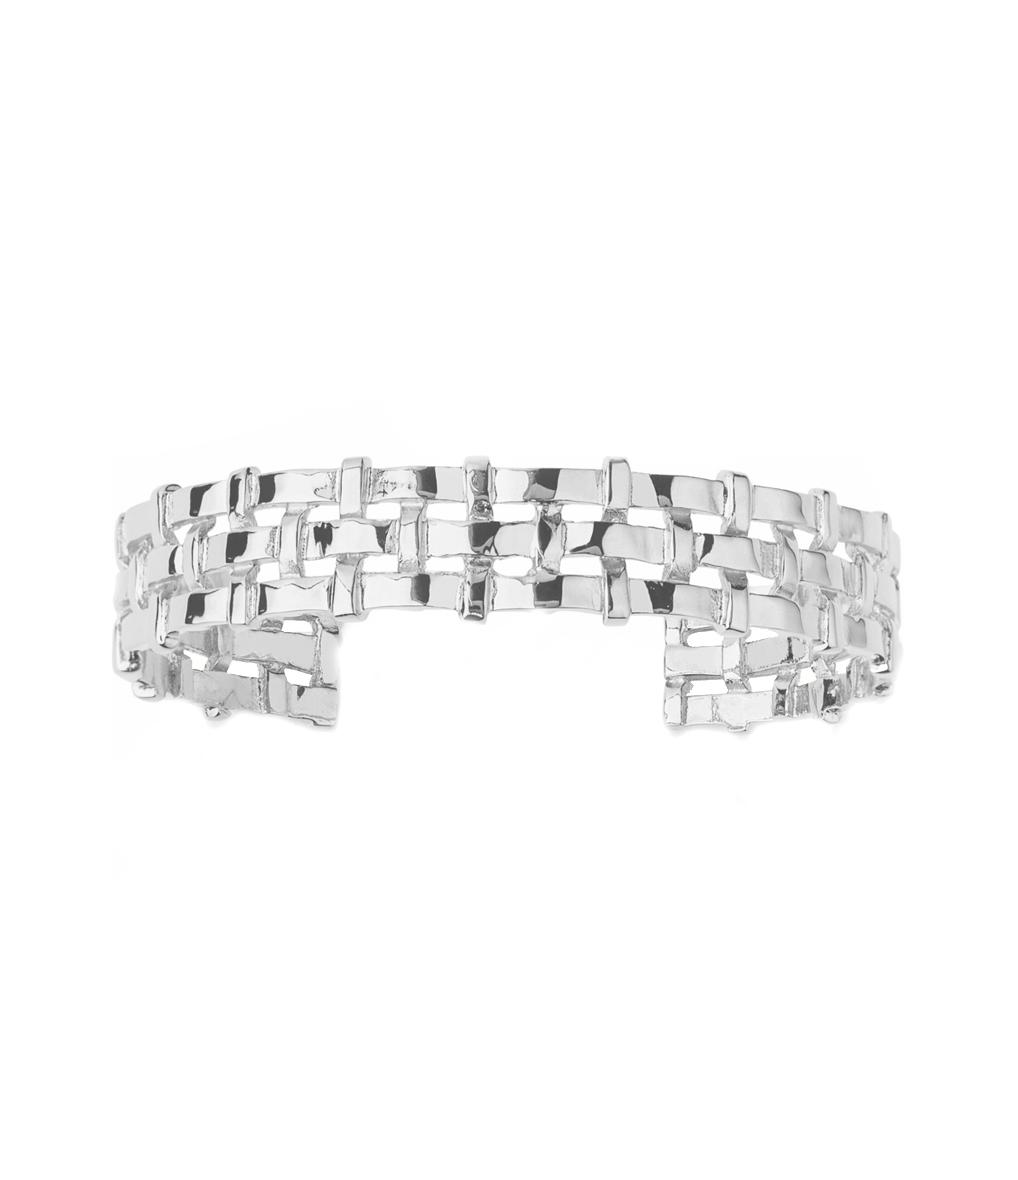 Bracelet Marella Silver